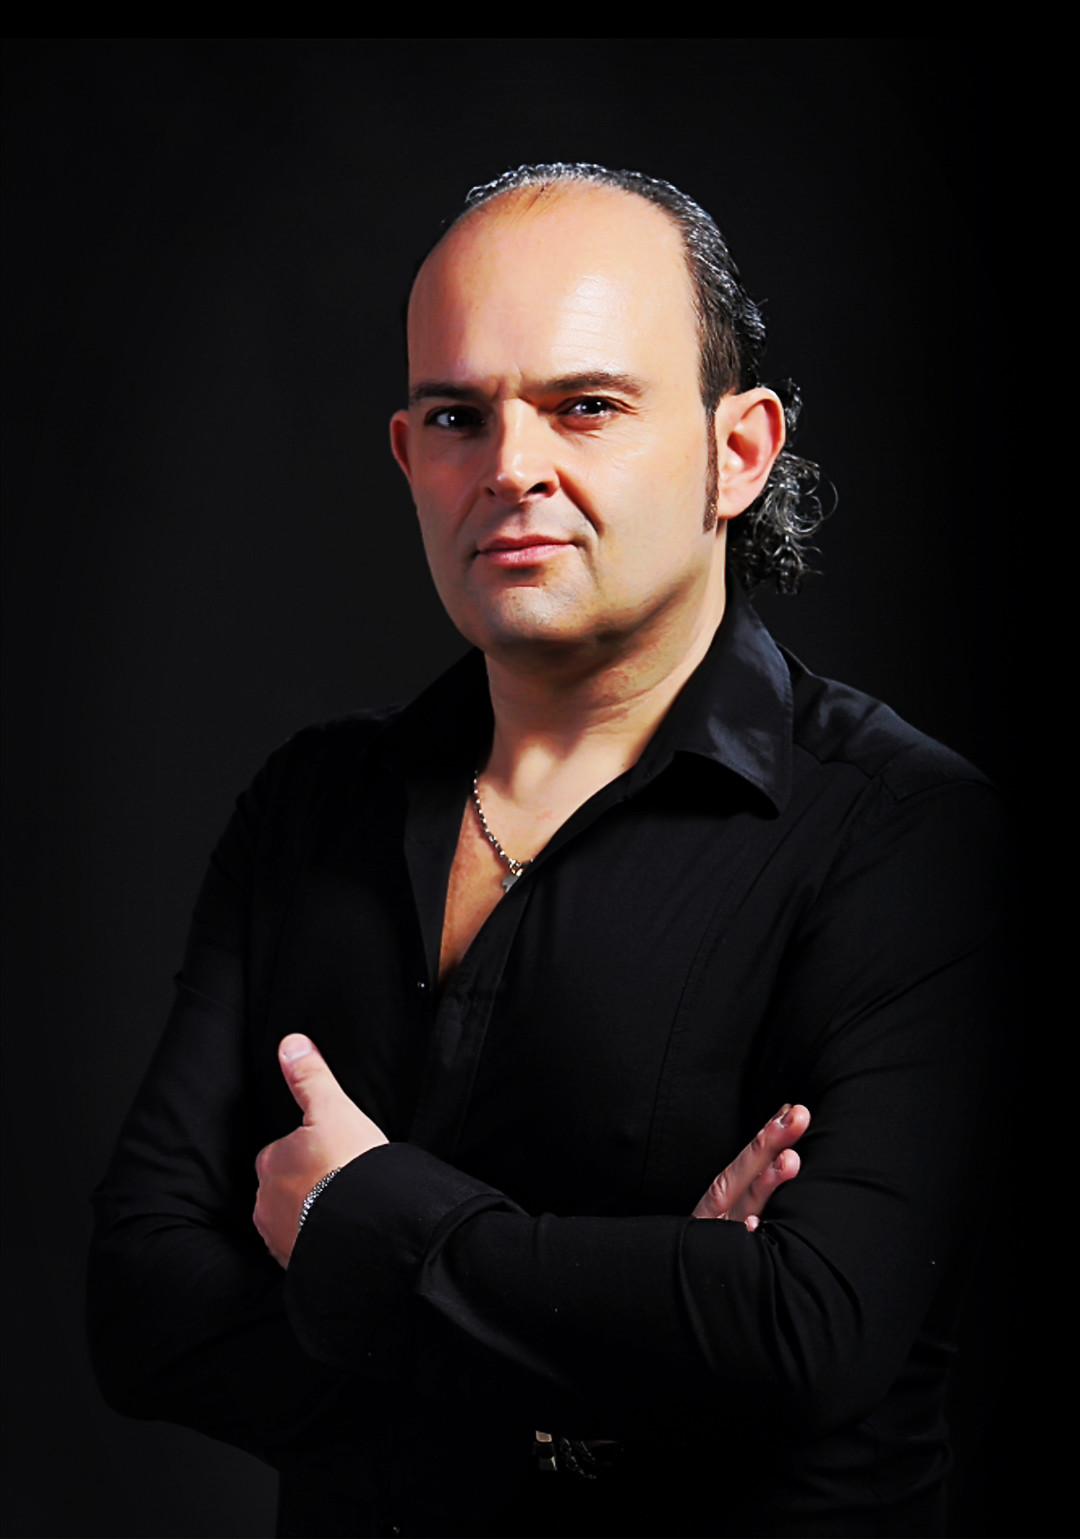 Claudio Florio